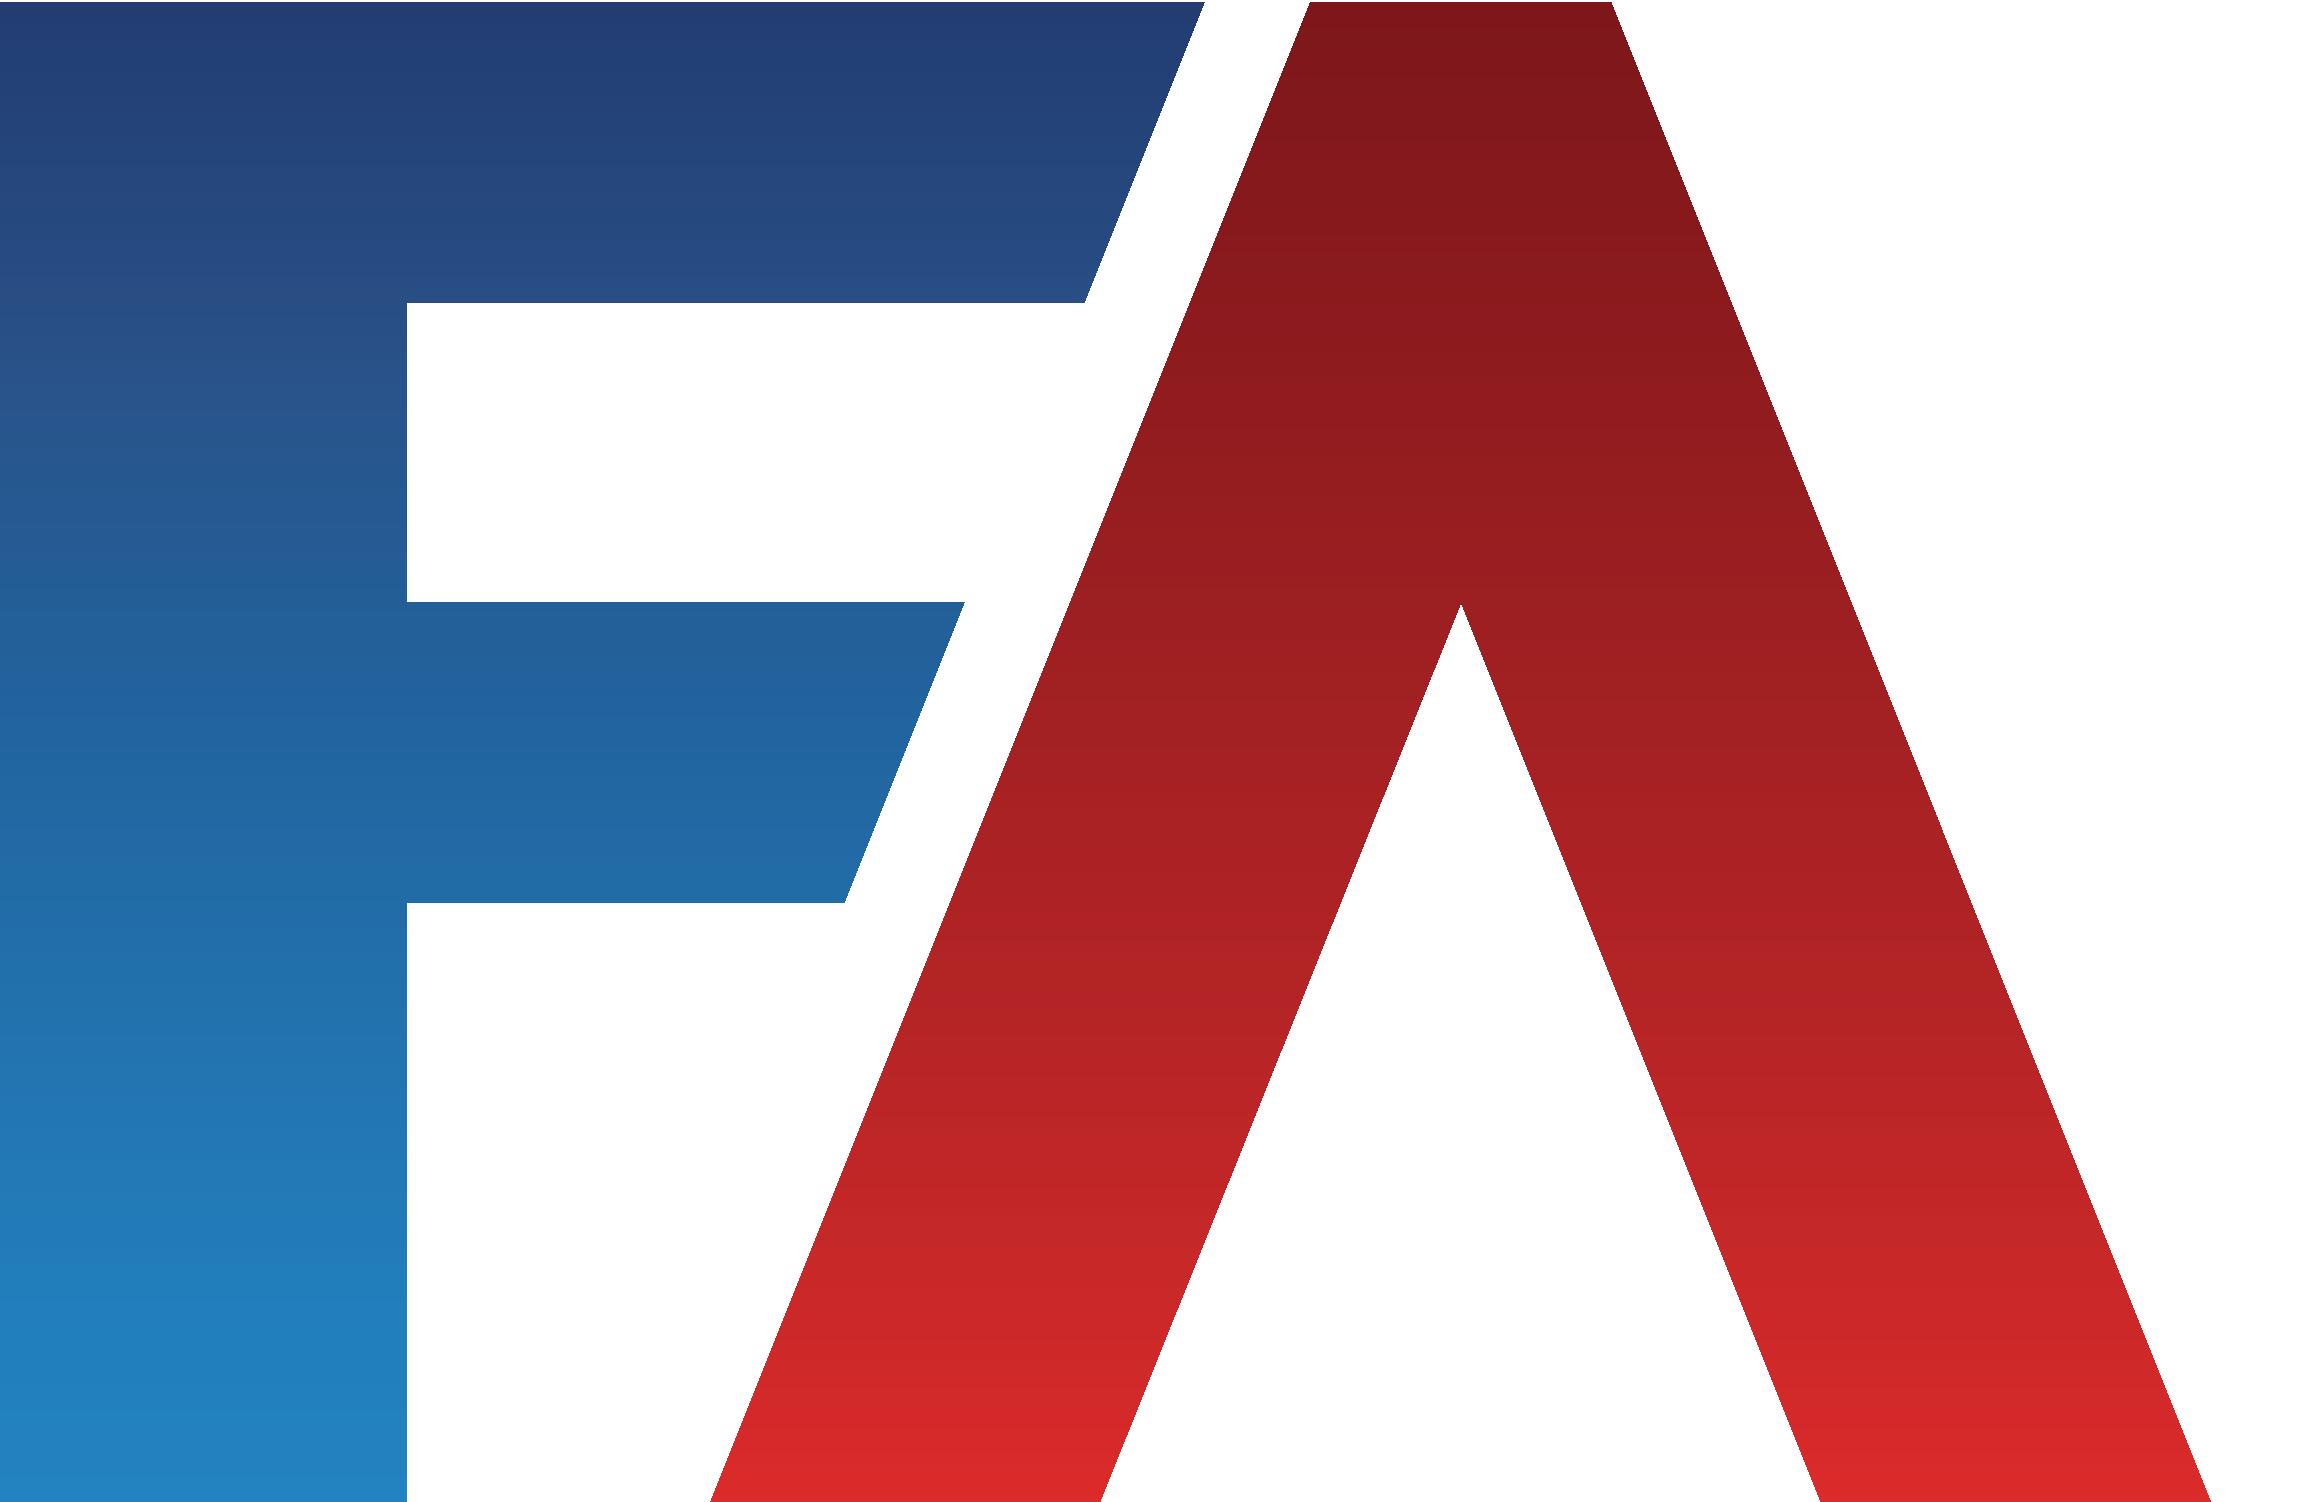 Astros | FantasyAlarm.com